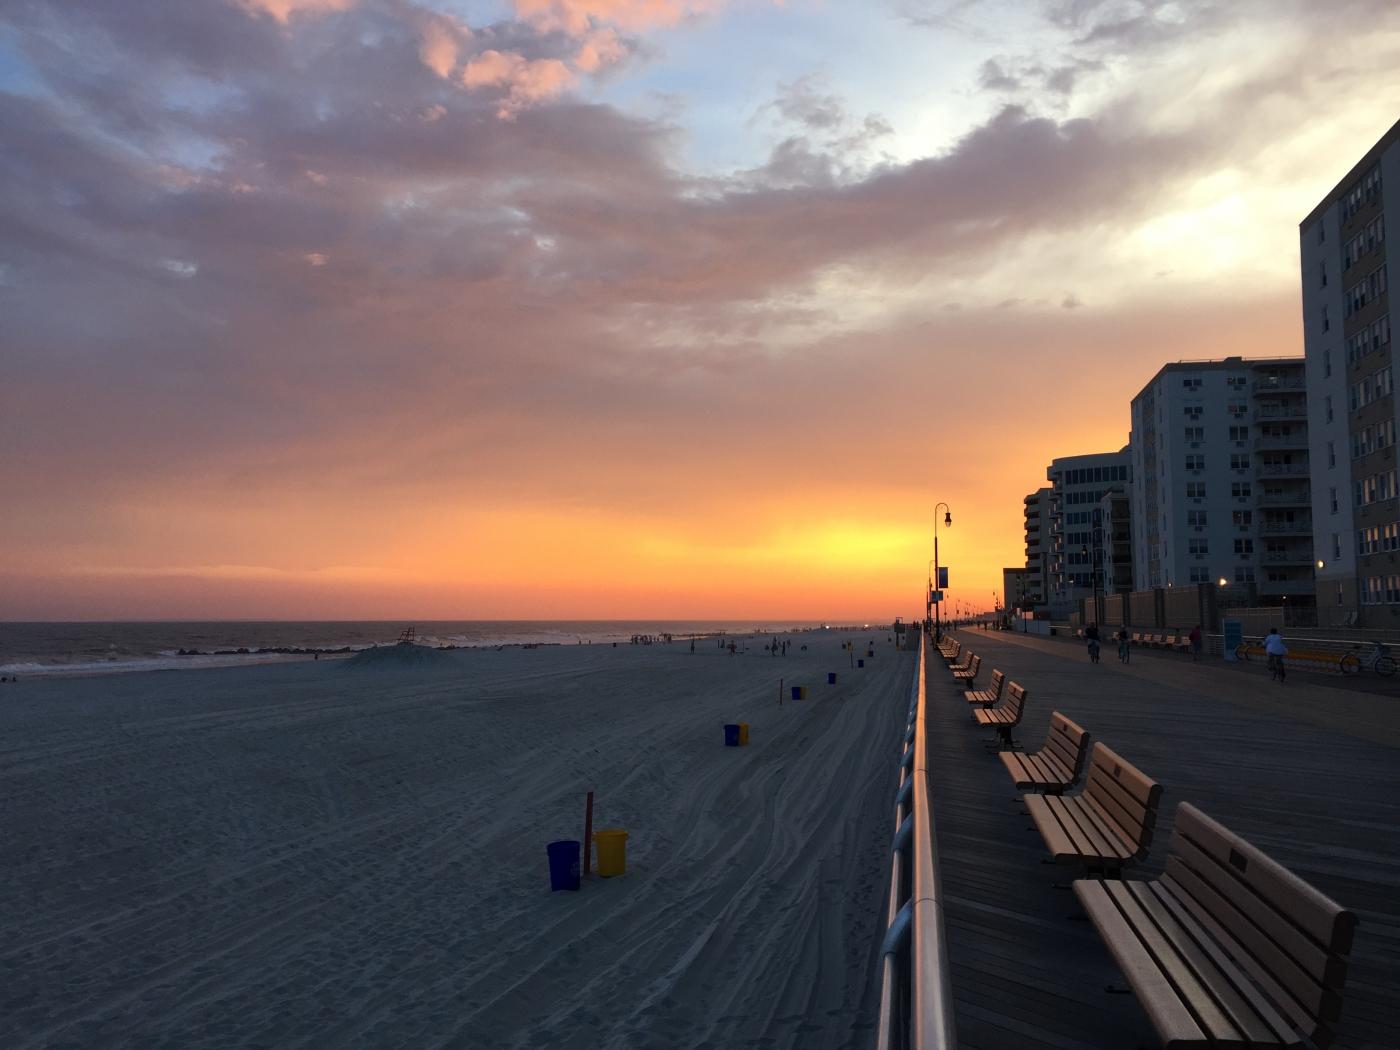 Long Beach 铺天盖地的晚霞(手机)_图1-2